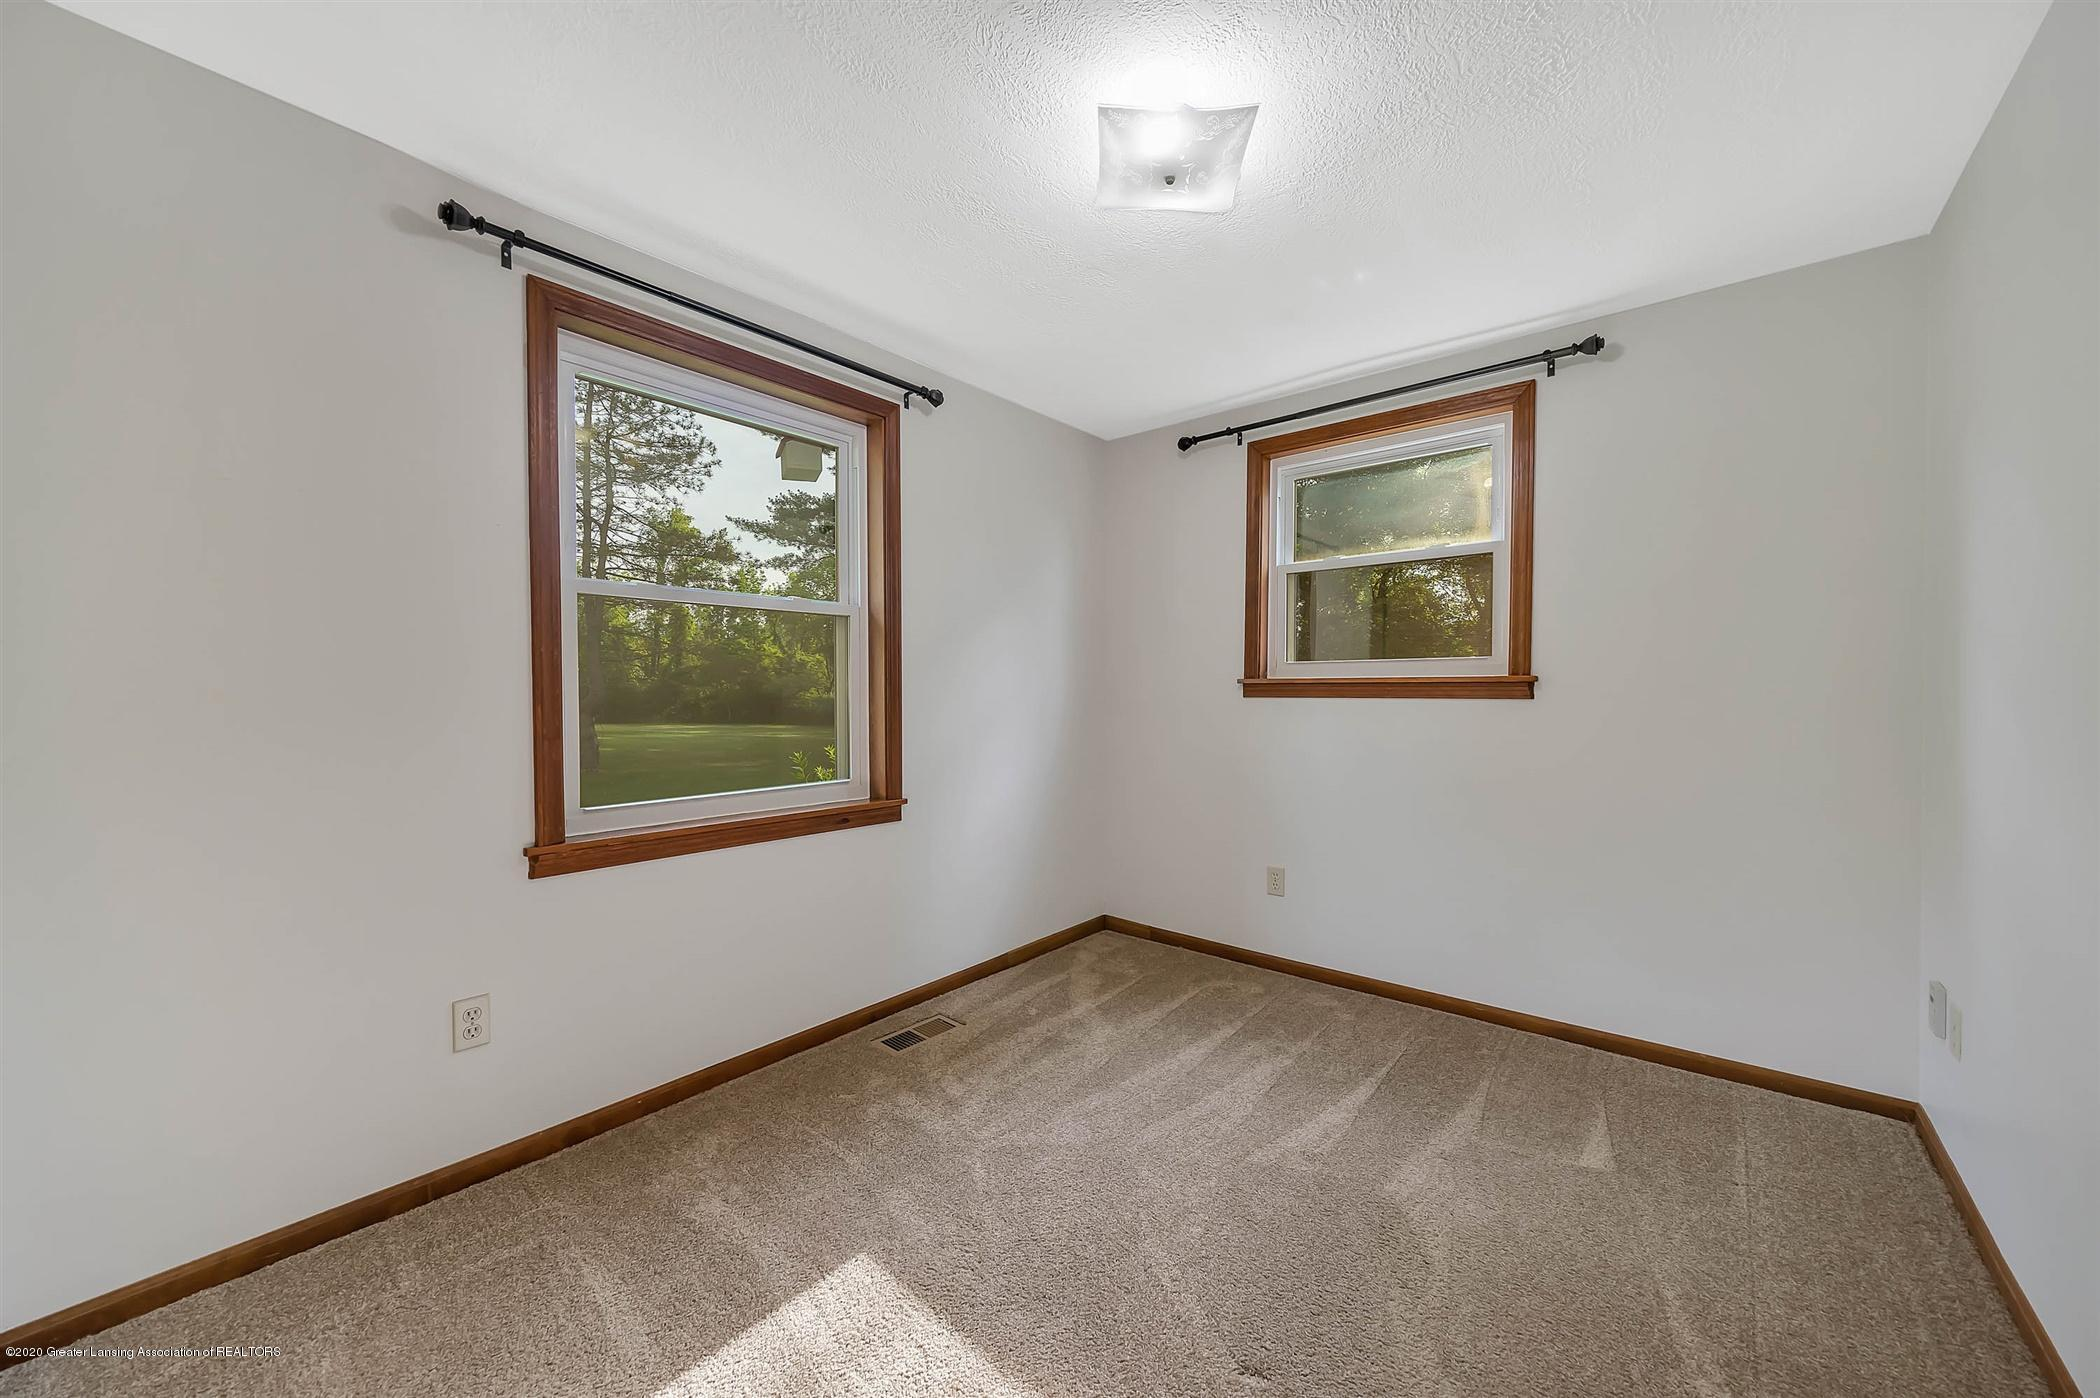 6750 W Lovejoy Rd - (13) 6750 Lovejoy Bedroom 1 - 13